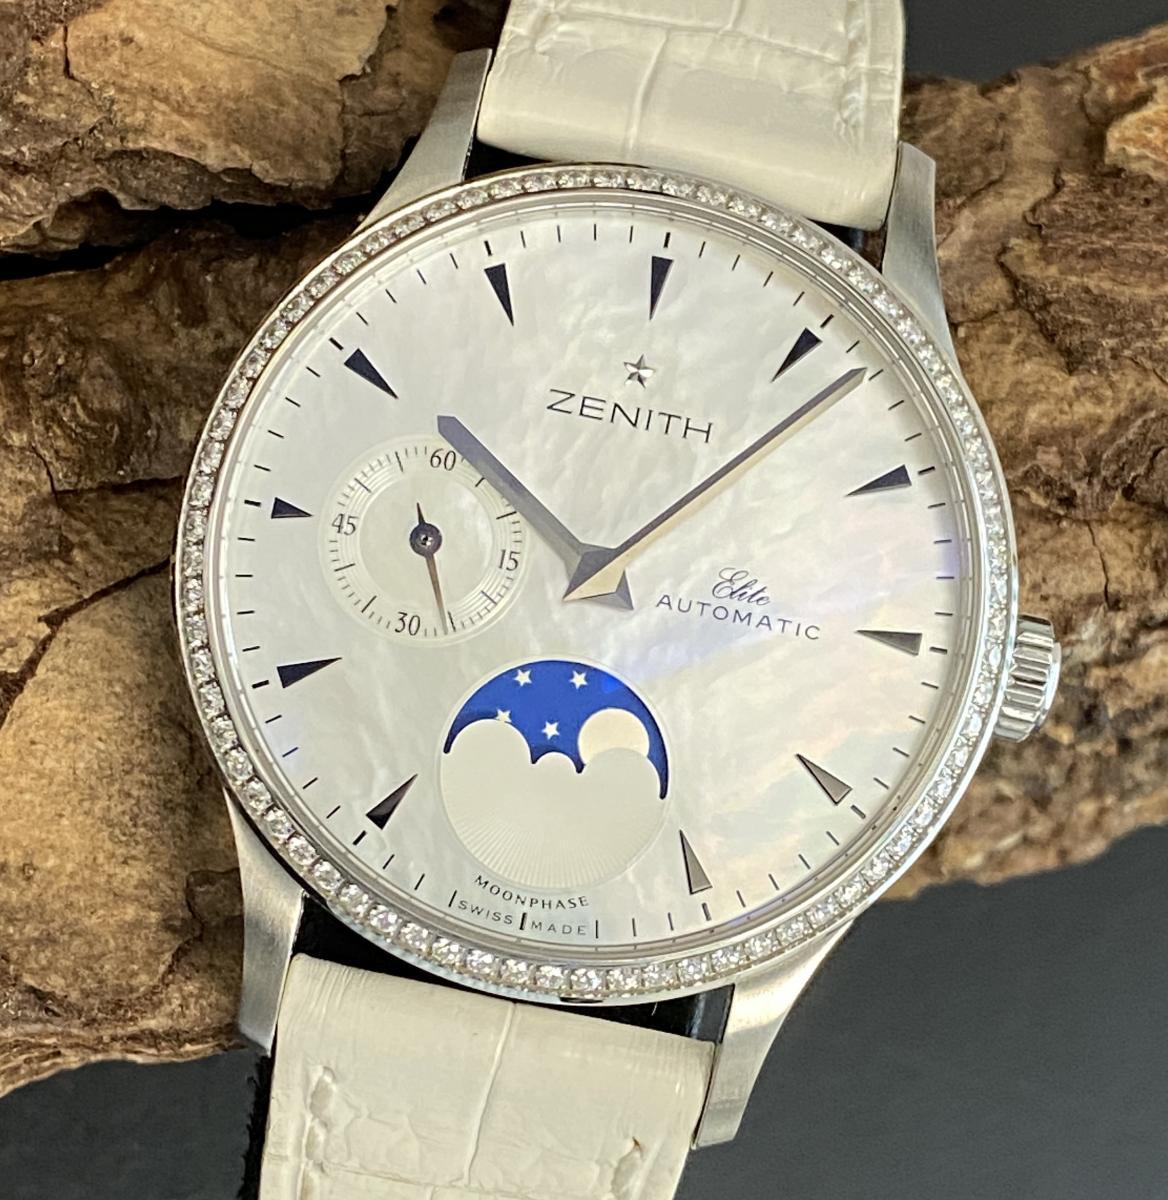 Zenith Lady with diamonds Ref. 03.1125.691/02.C490